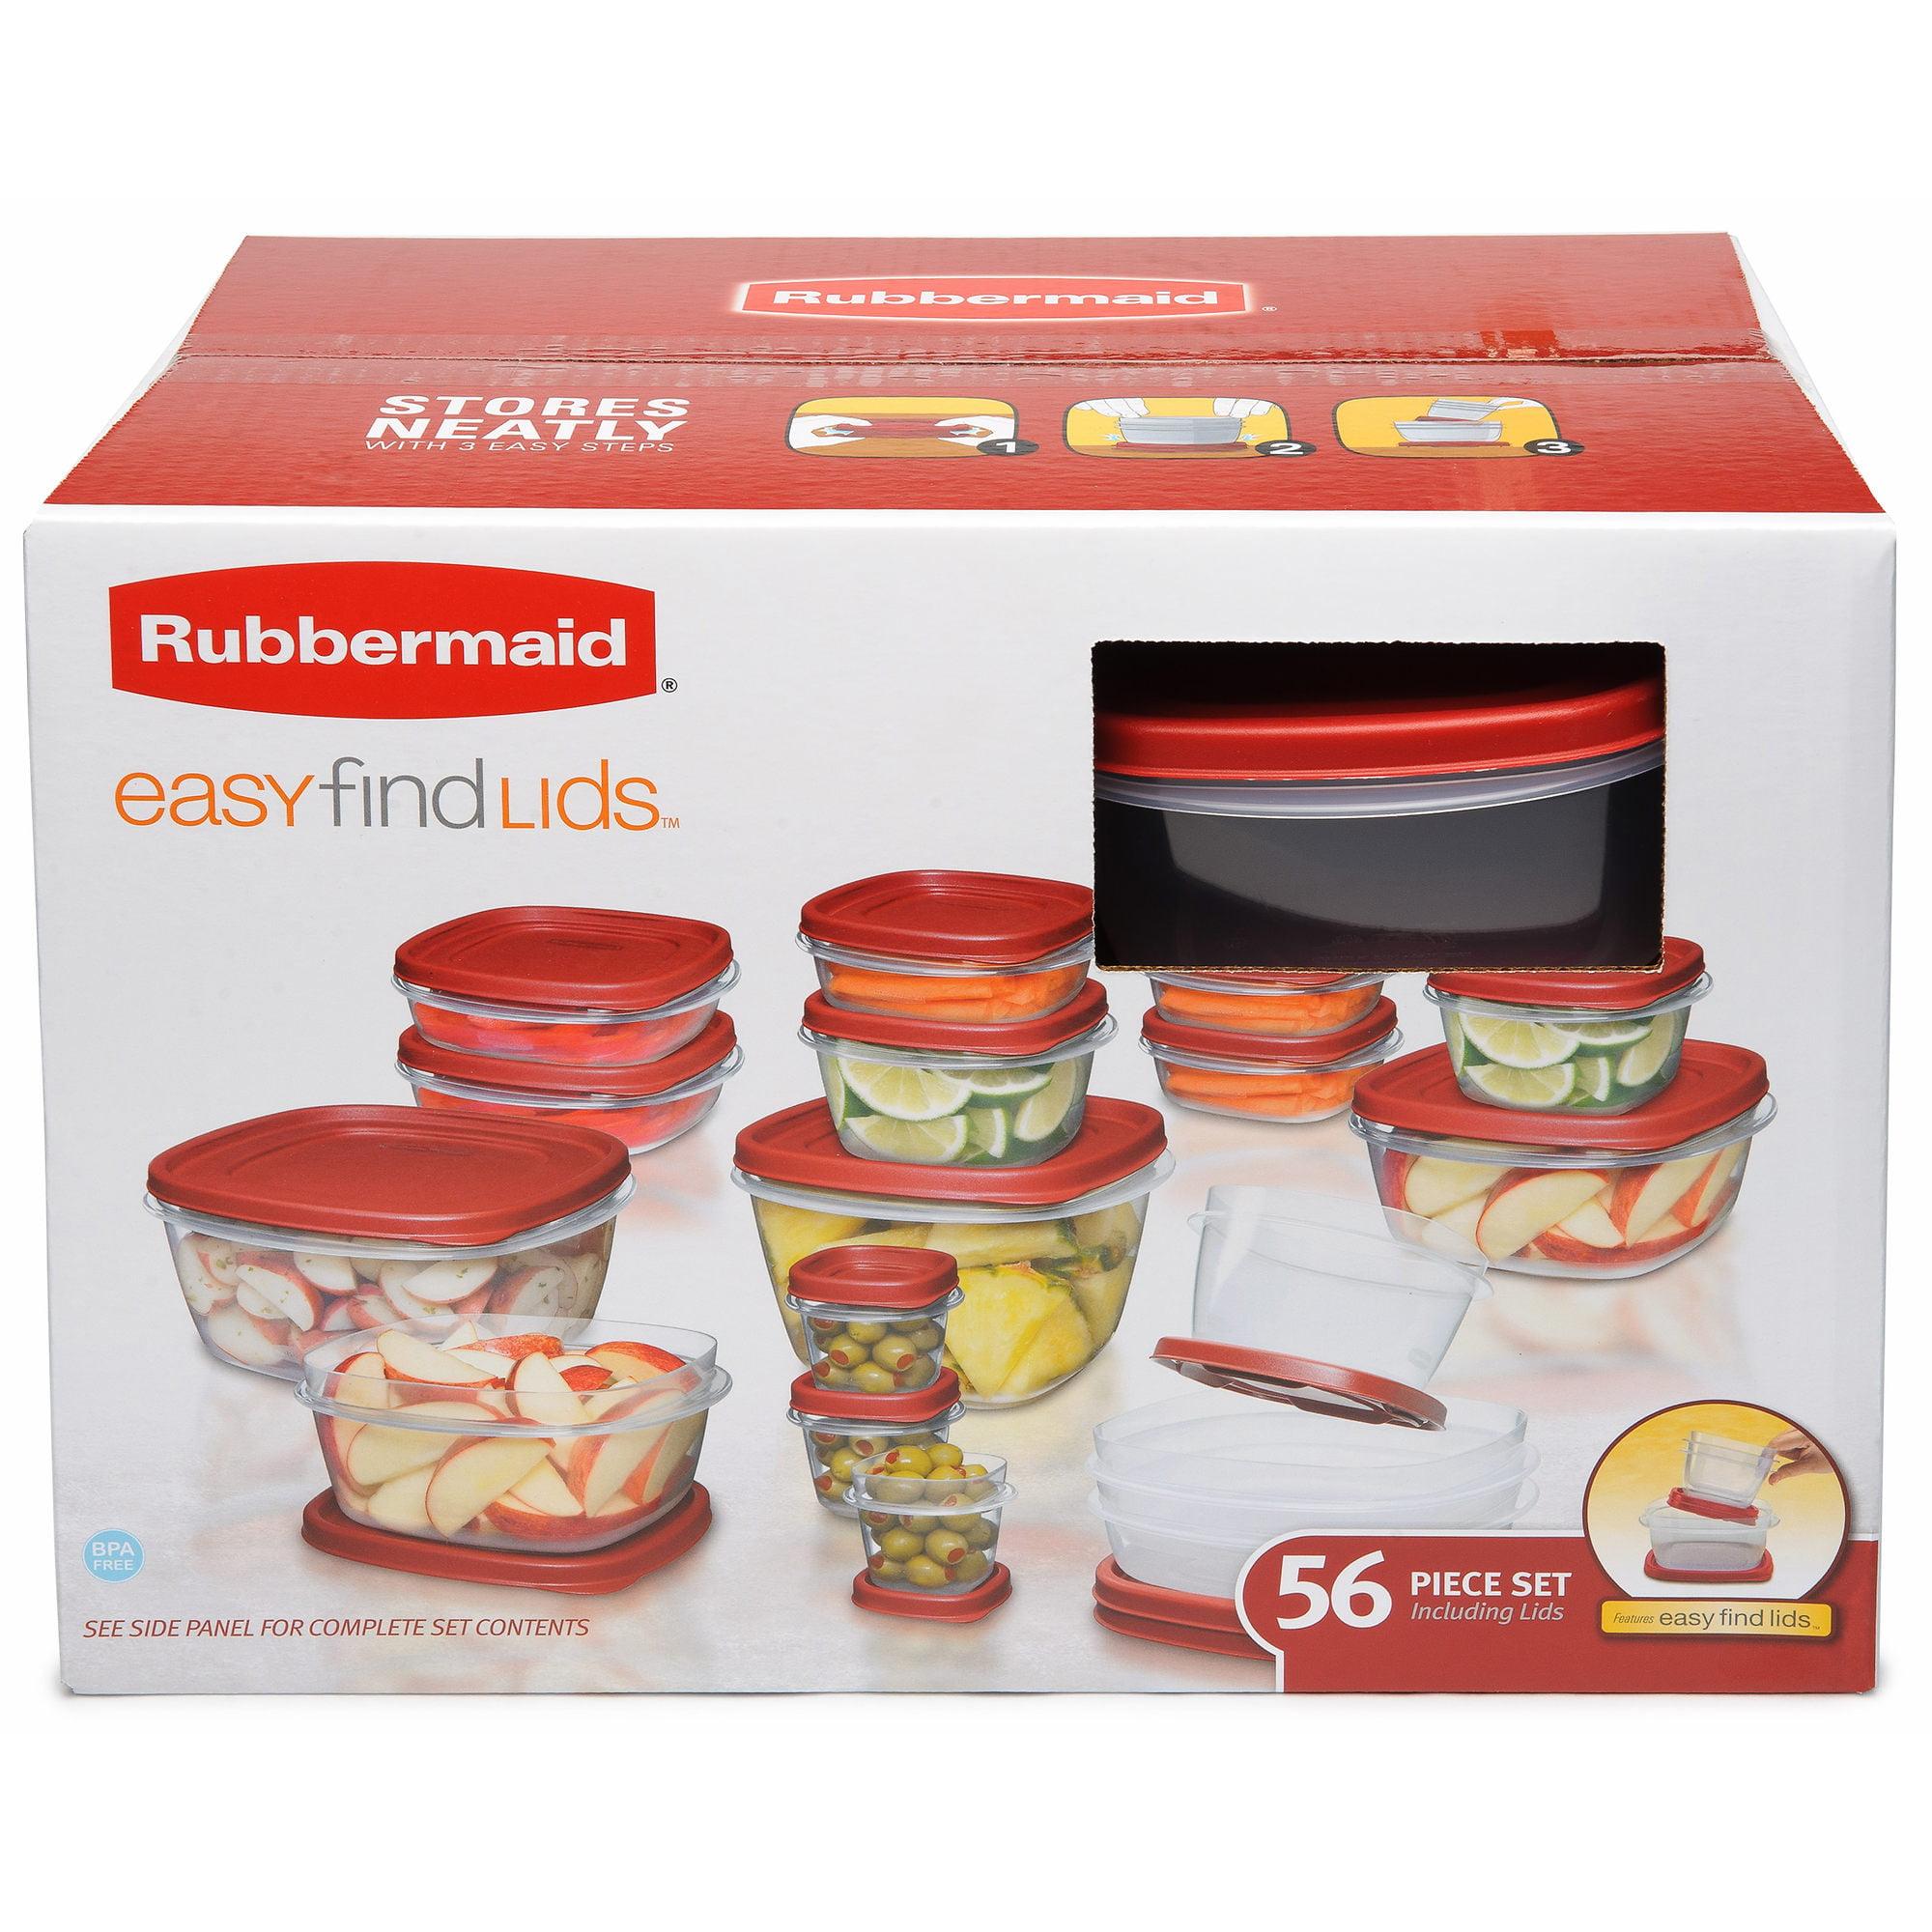 sc 1 st  Walmart & Rubbermaid 56-Pc. Food Container Set - Walmart.com